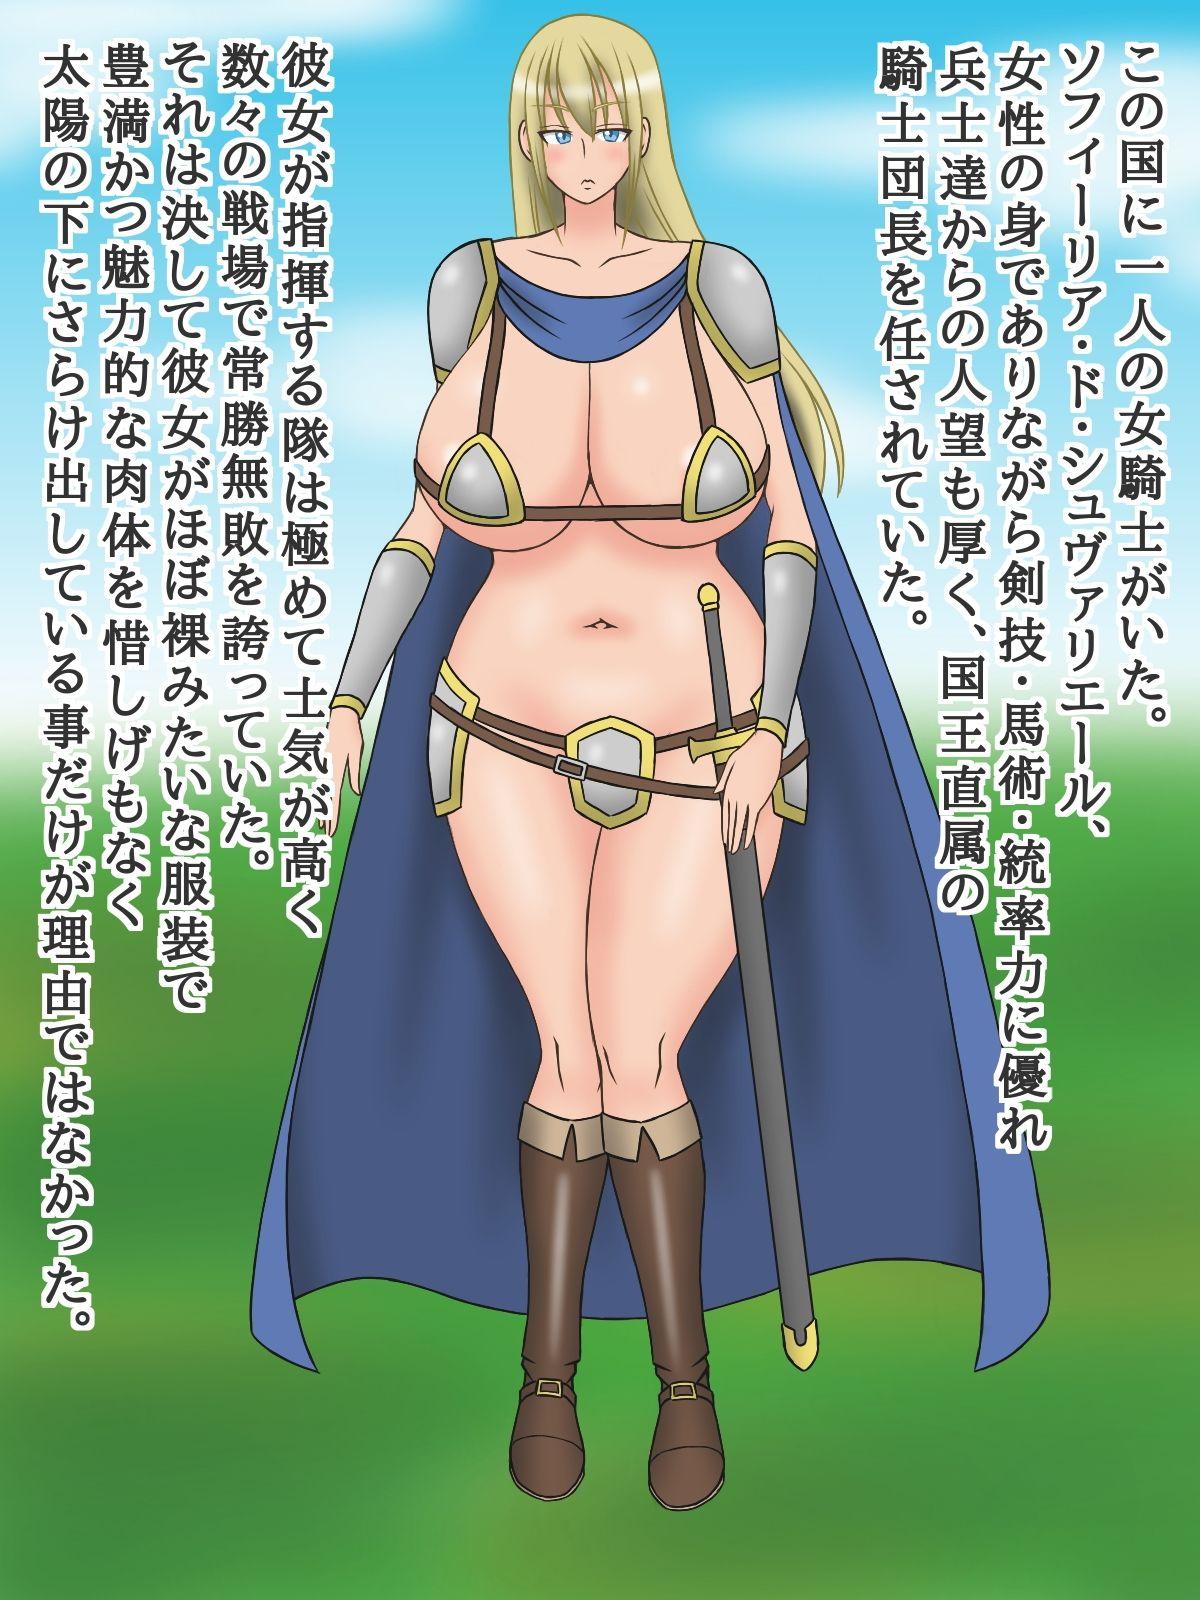 【sato 同人】爆乳女騎士とショタ王子